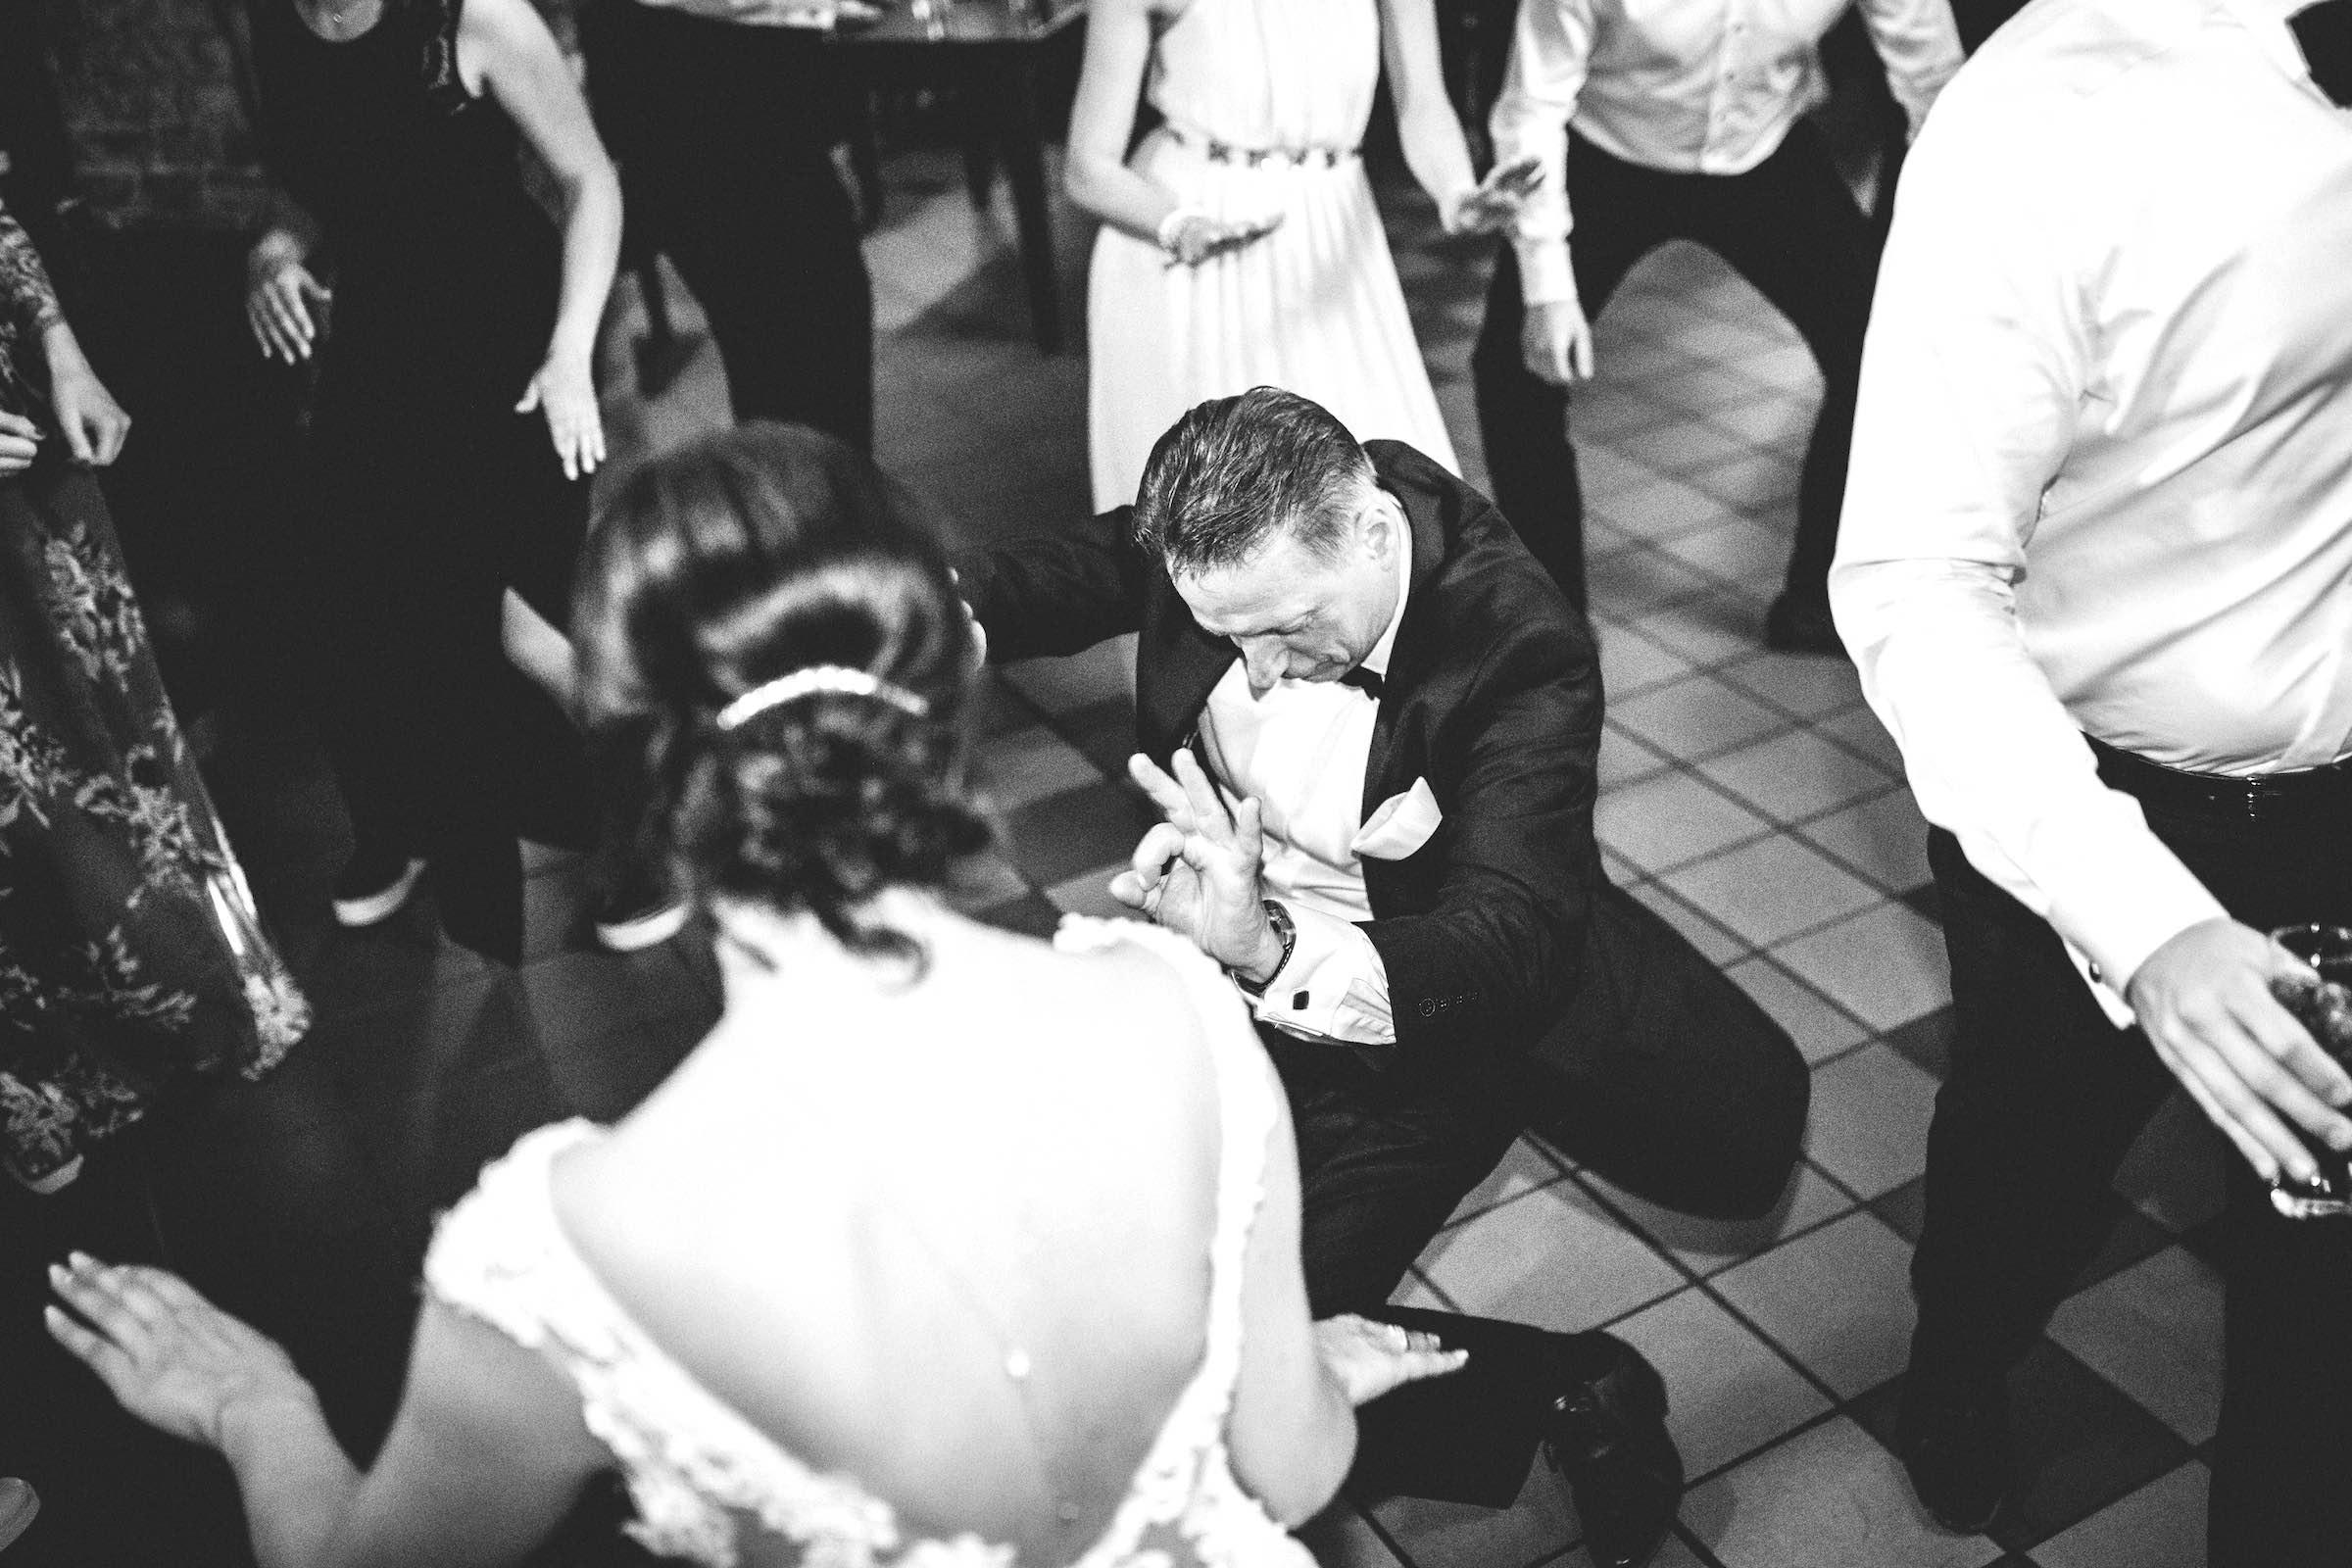 DJ | Hochzeit | DJ | Agentur | DJ | Messe | DJ | Firmenevent | Firmenfeier | DJ | Geburtstag | Discjockey | Party | DJ | Sommerfest | Event | Buchen | Rittergut | Wichtringhausen | Mieten | Lehmann | Eventservice